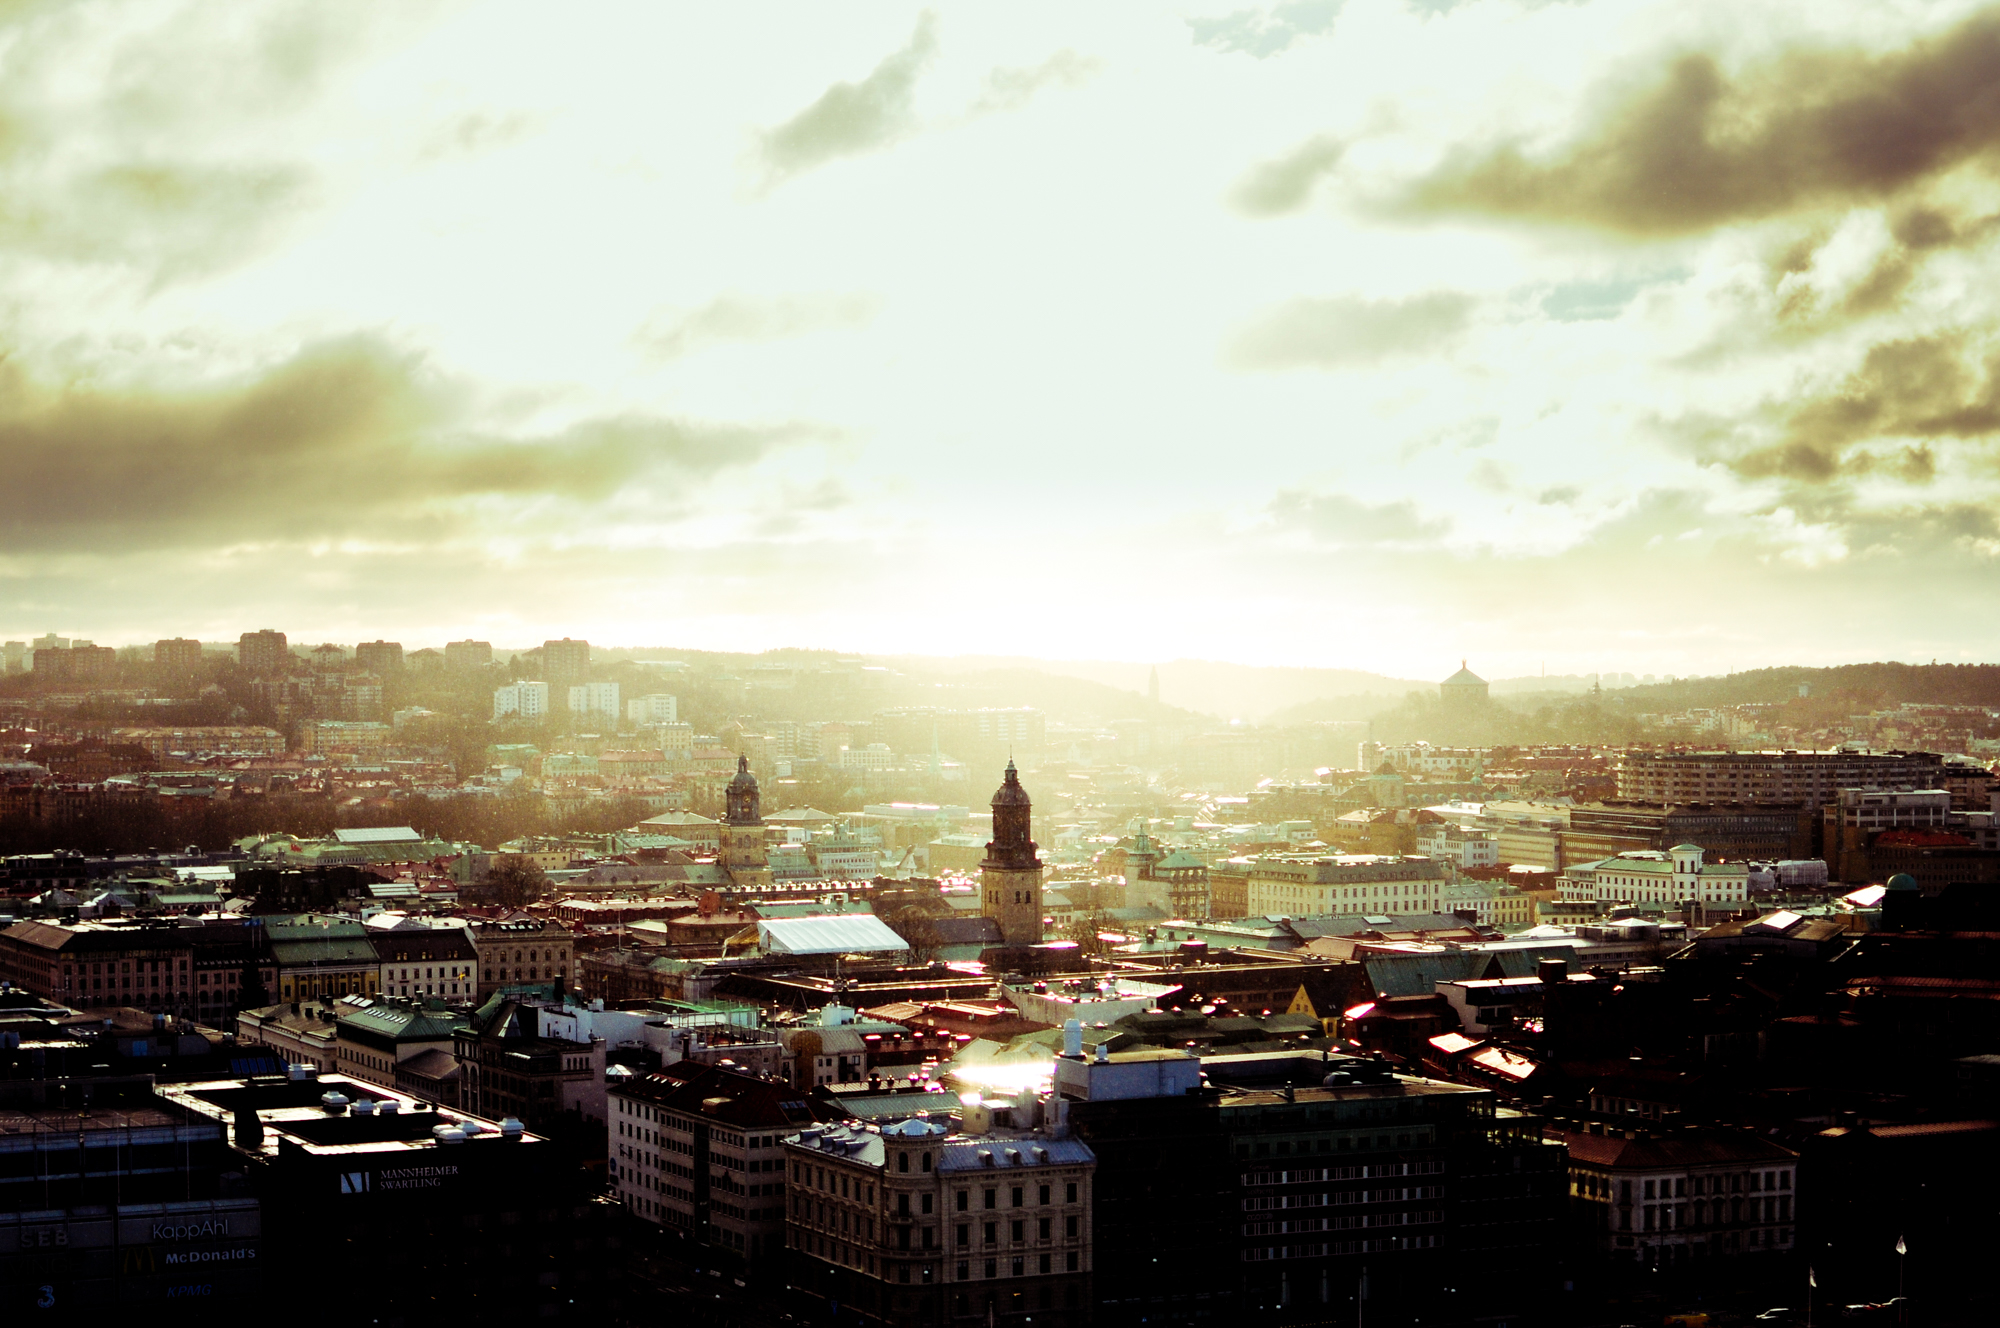 Göteborg (4 of 4)